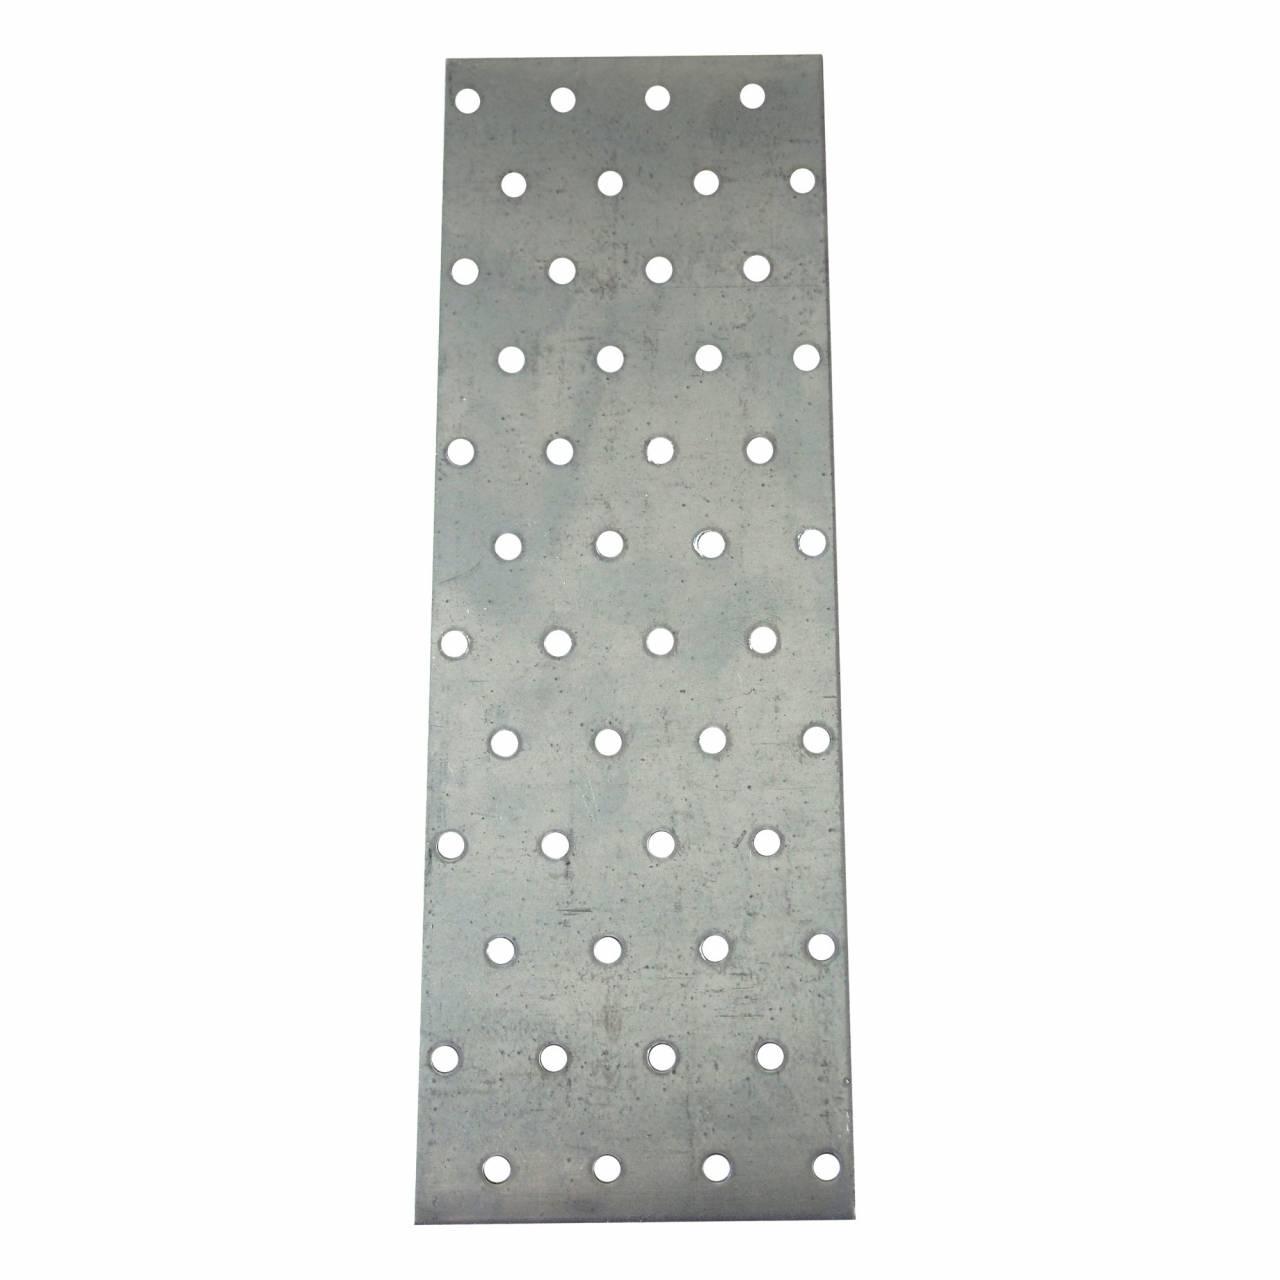 Lochplatte vz 80 x 240 x 2 mm